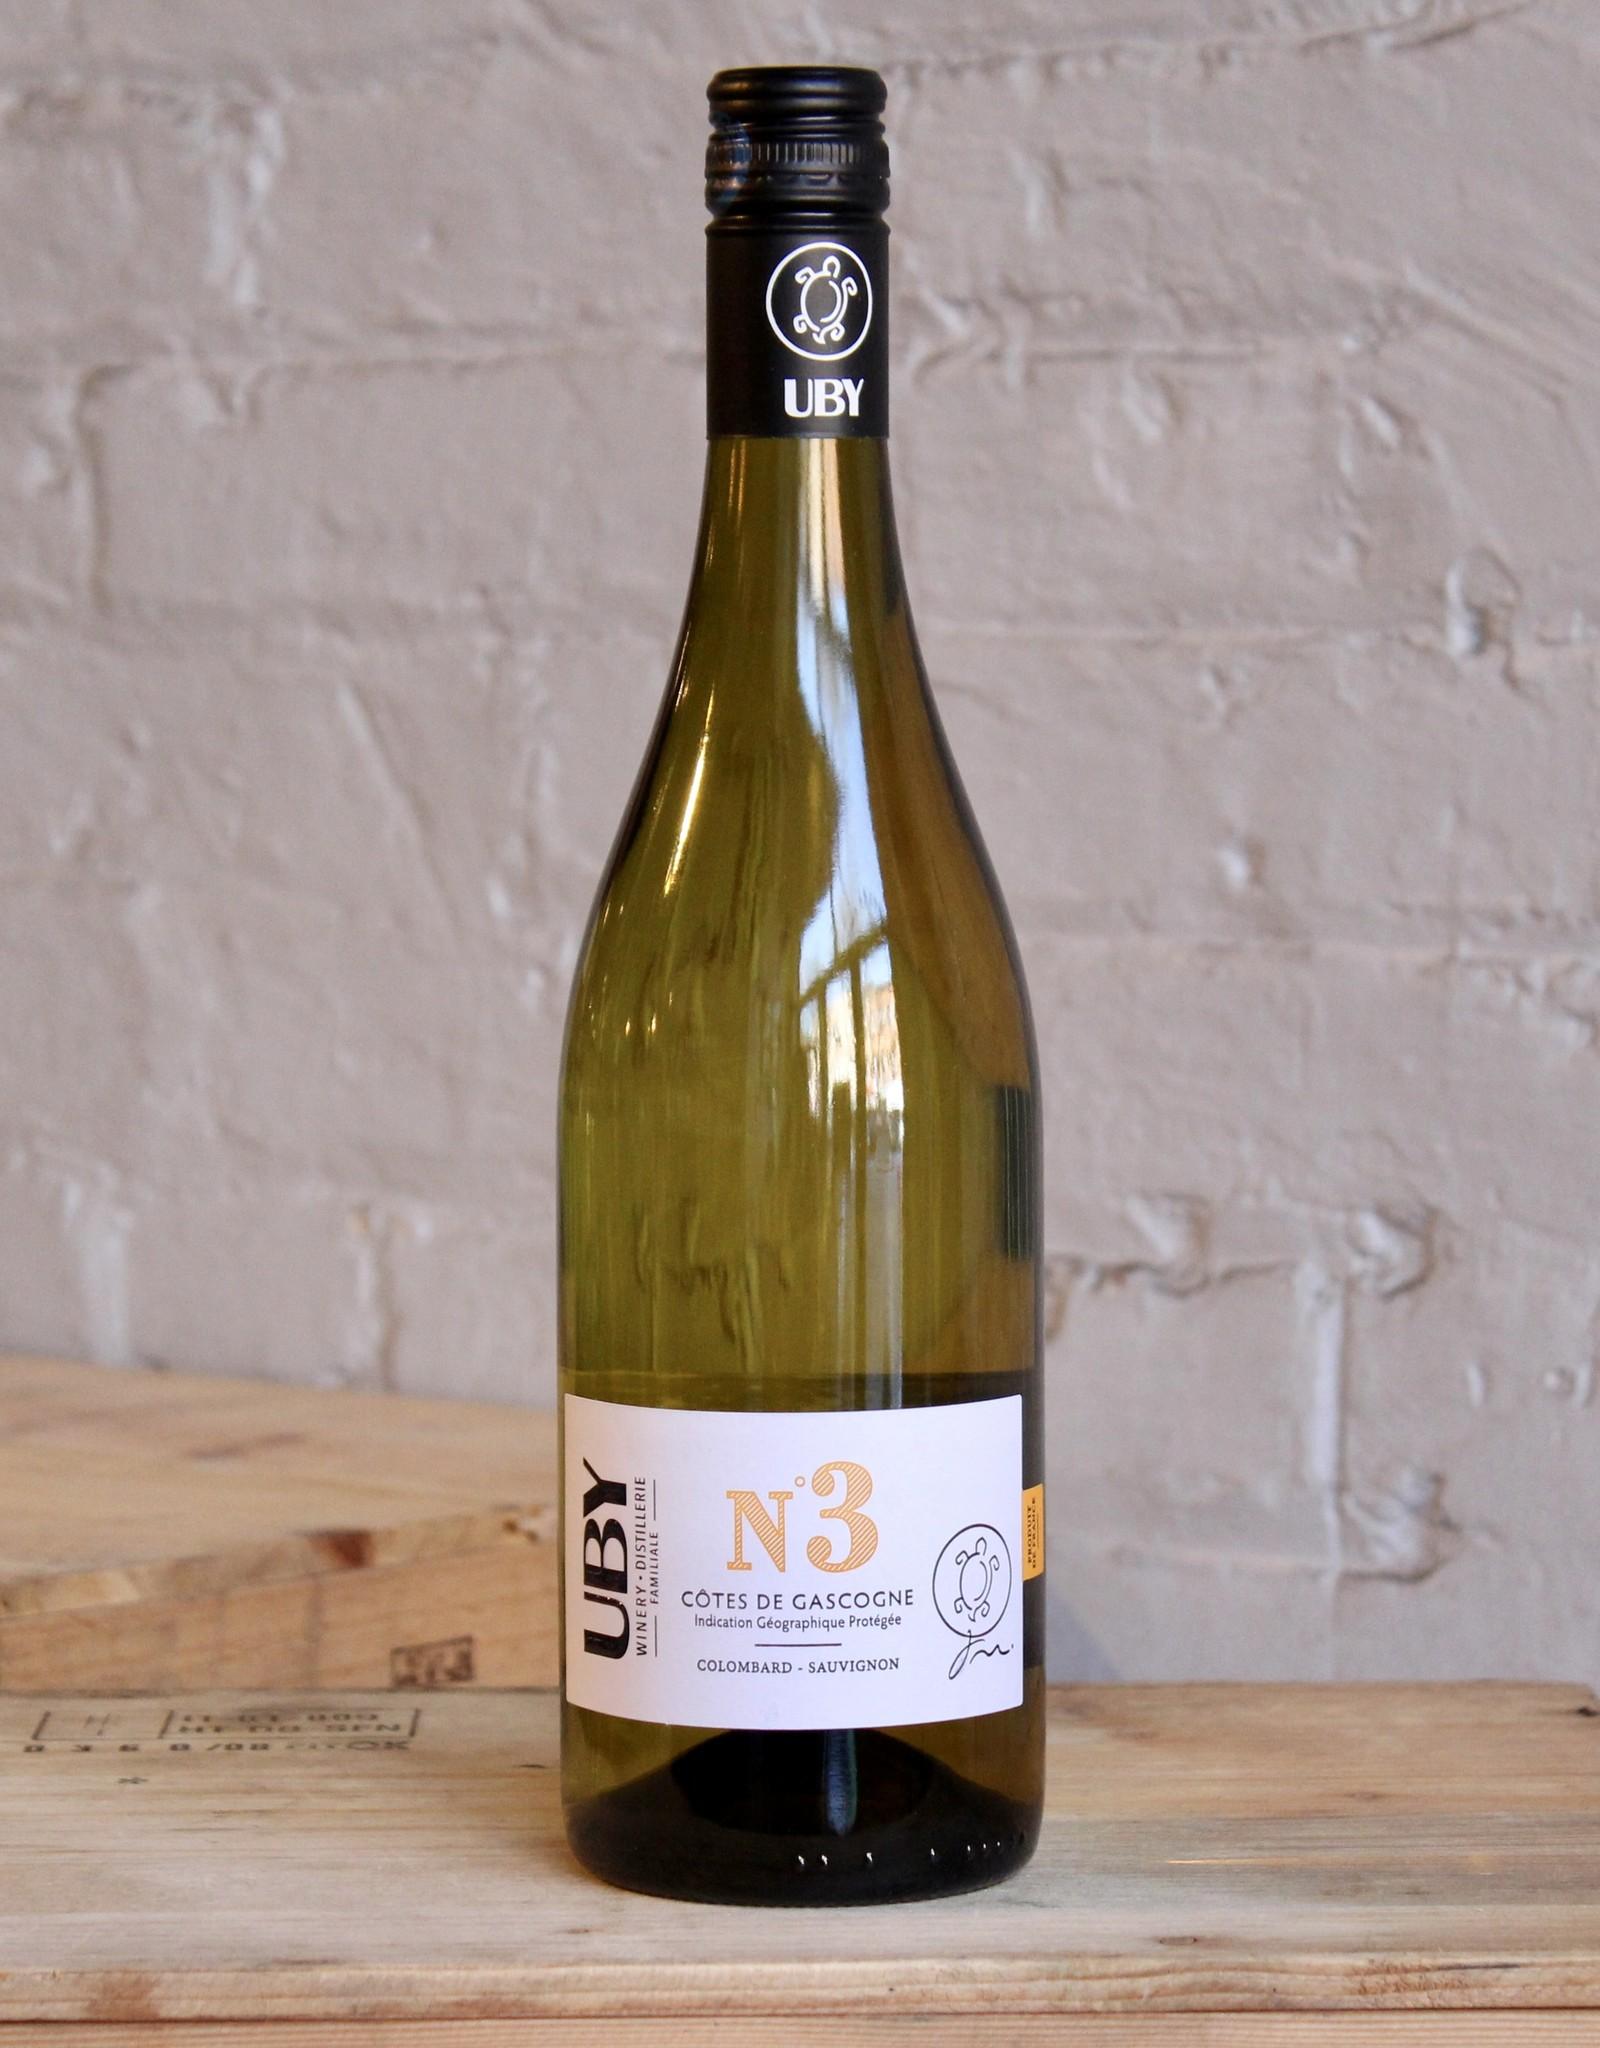 Wine 2020 No. 3 Uby Colombard/Ugni Blanc - Cotes de Gascogne, France (750ml)